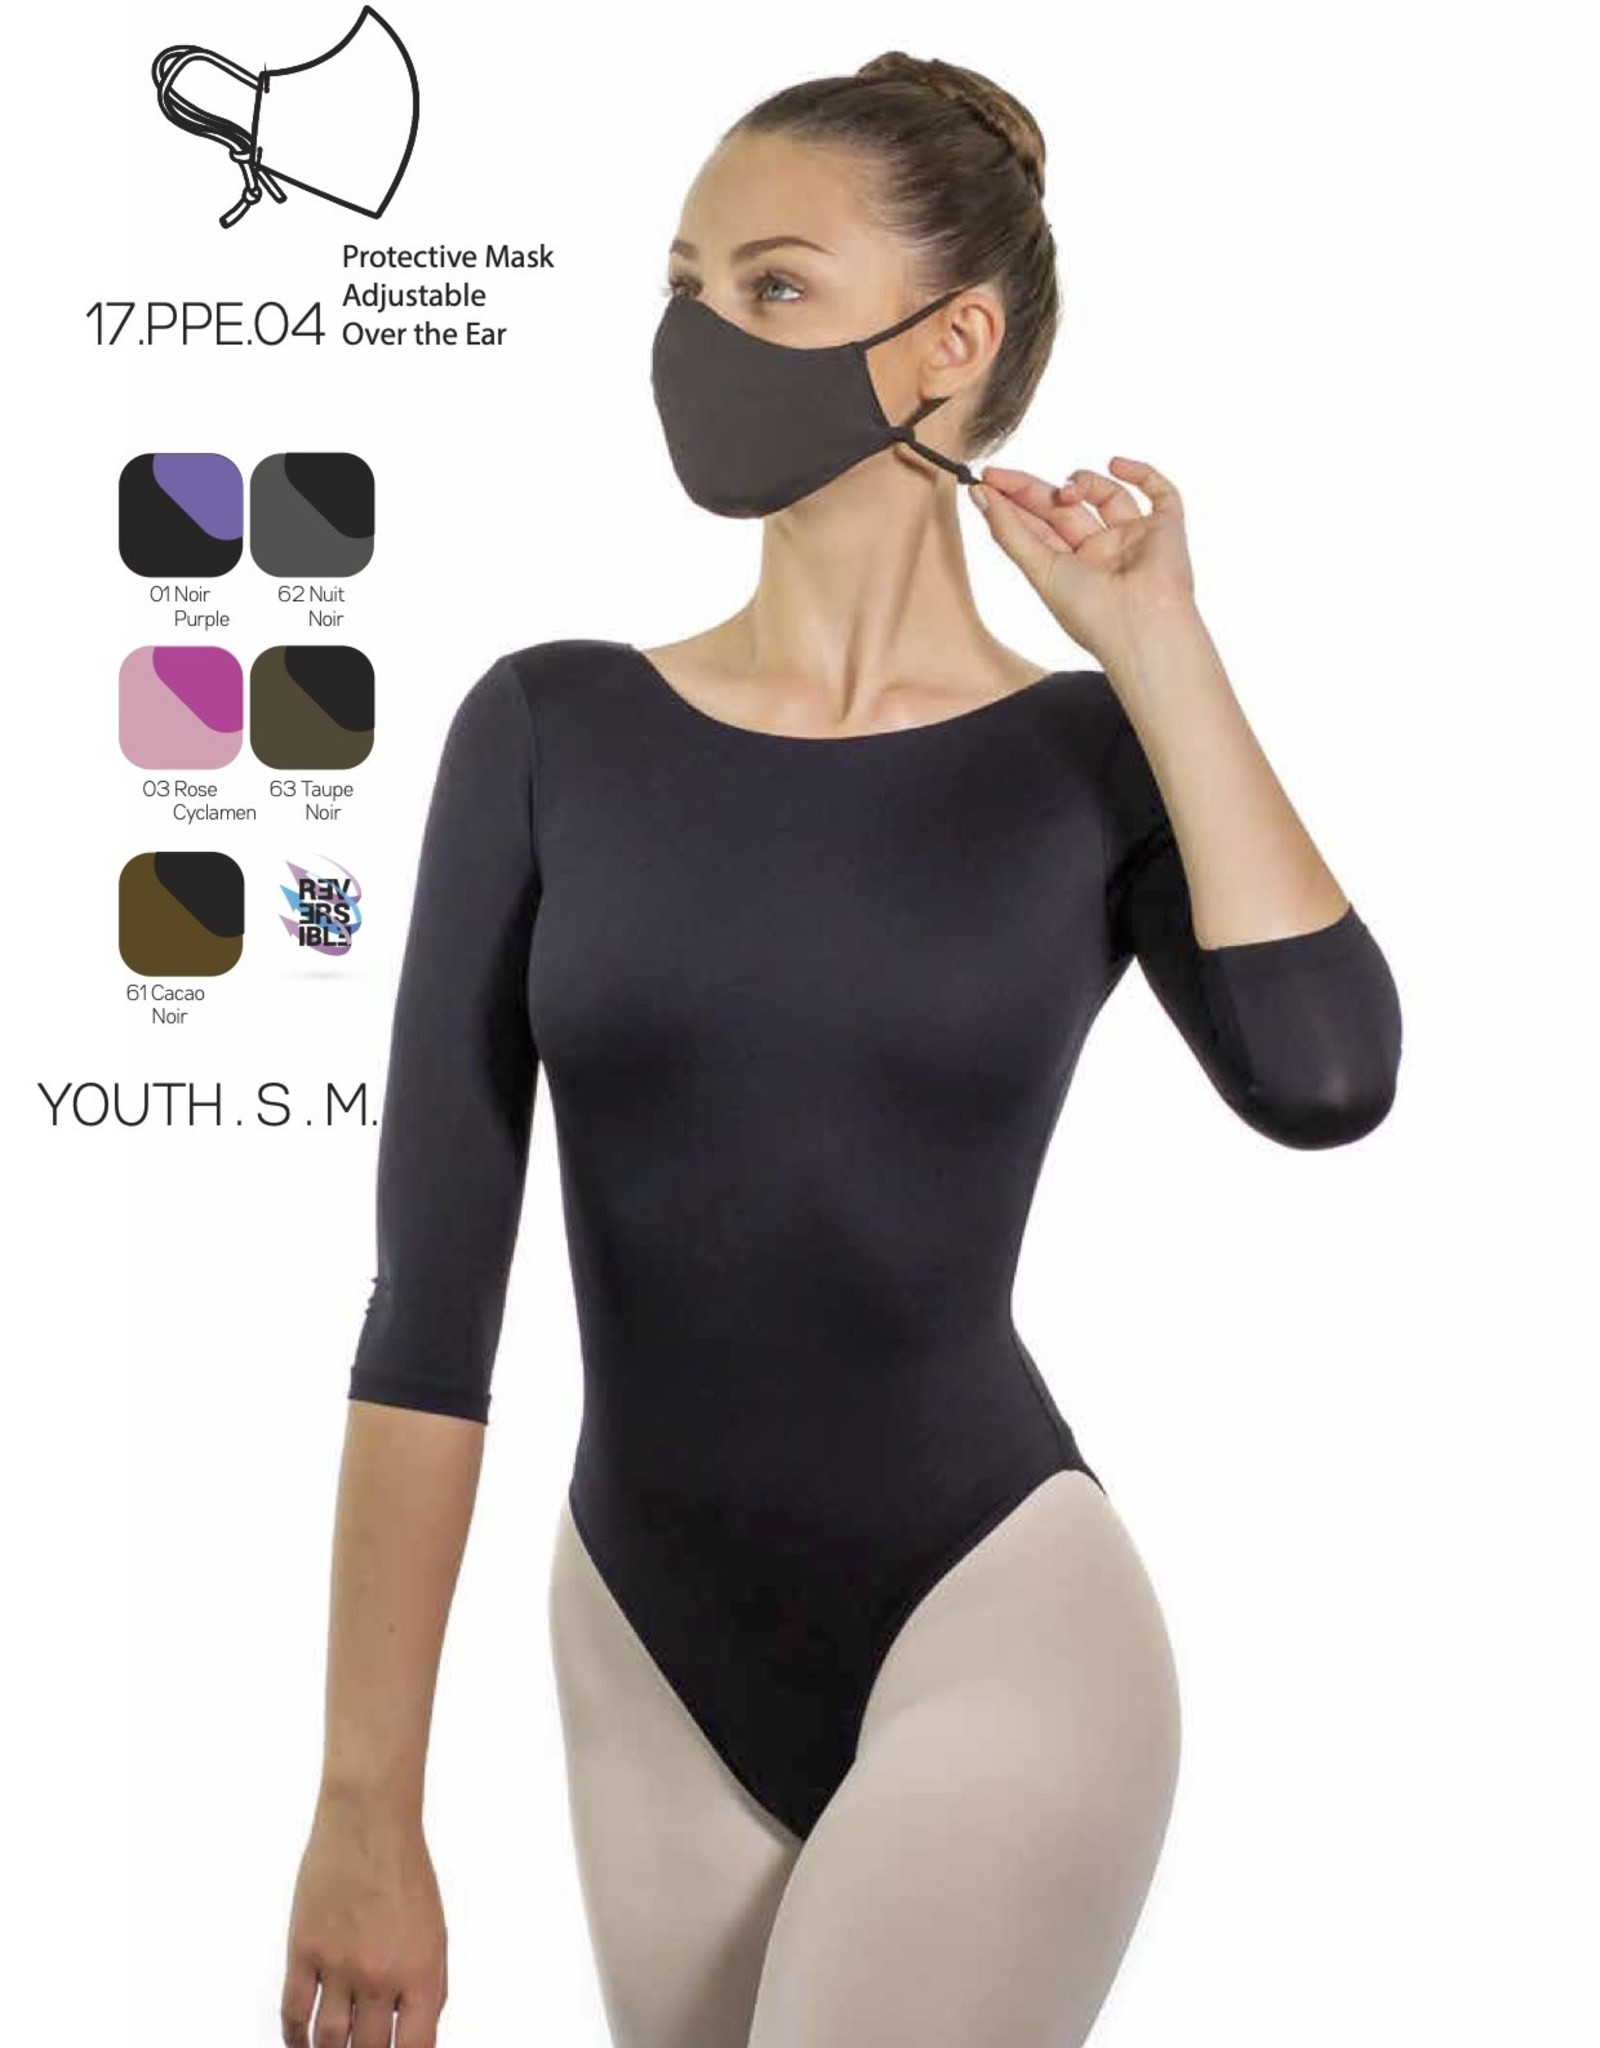 Ballet Rosa Mask 04